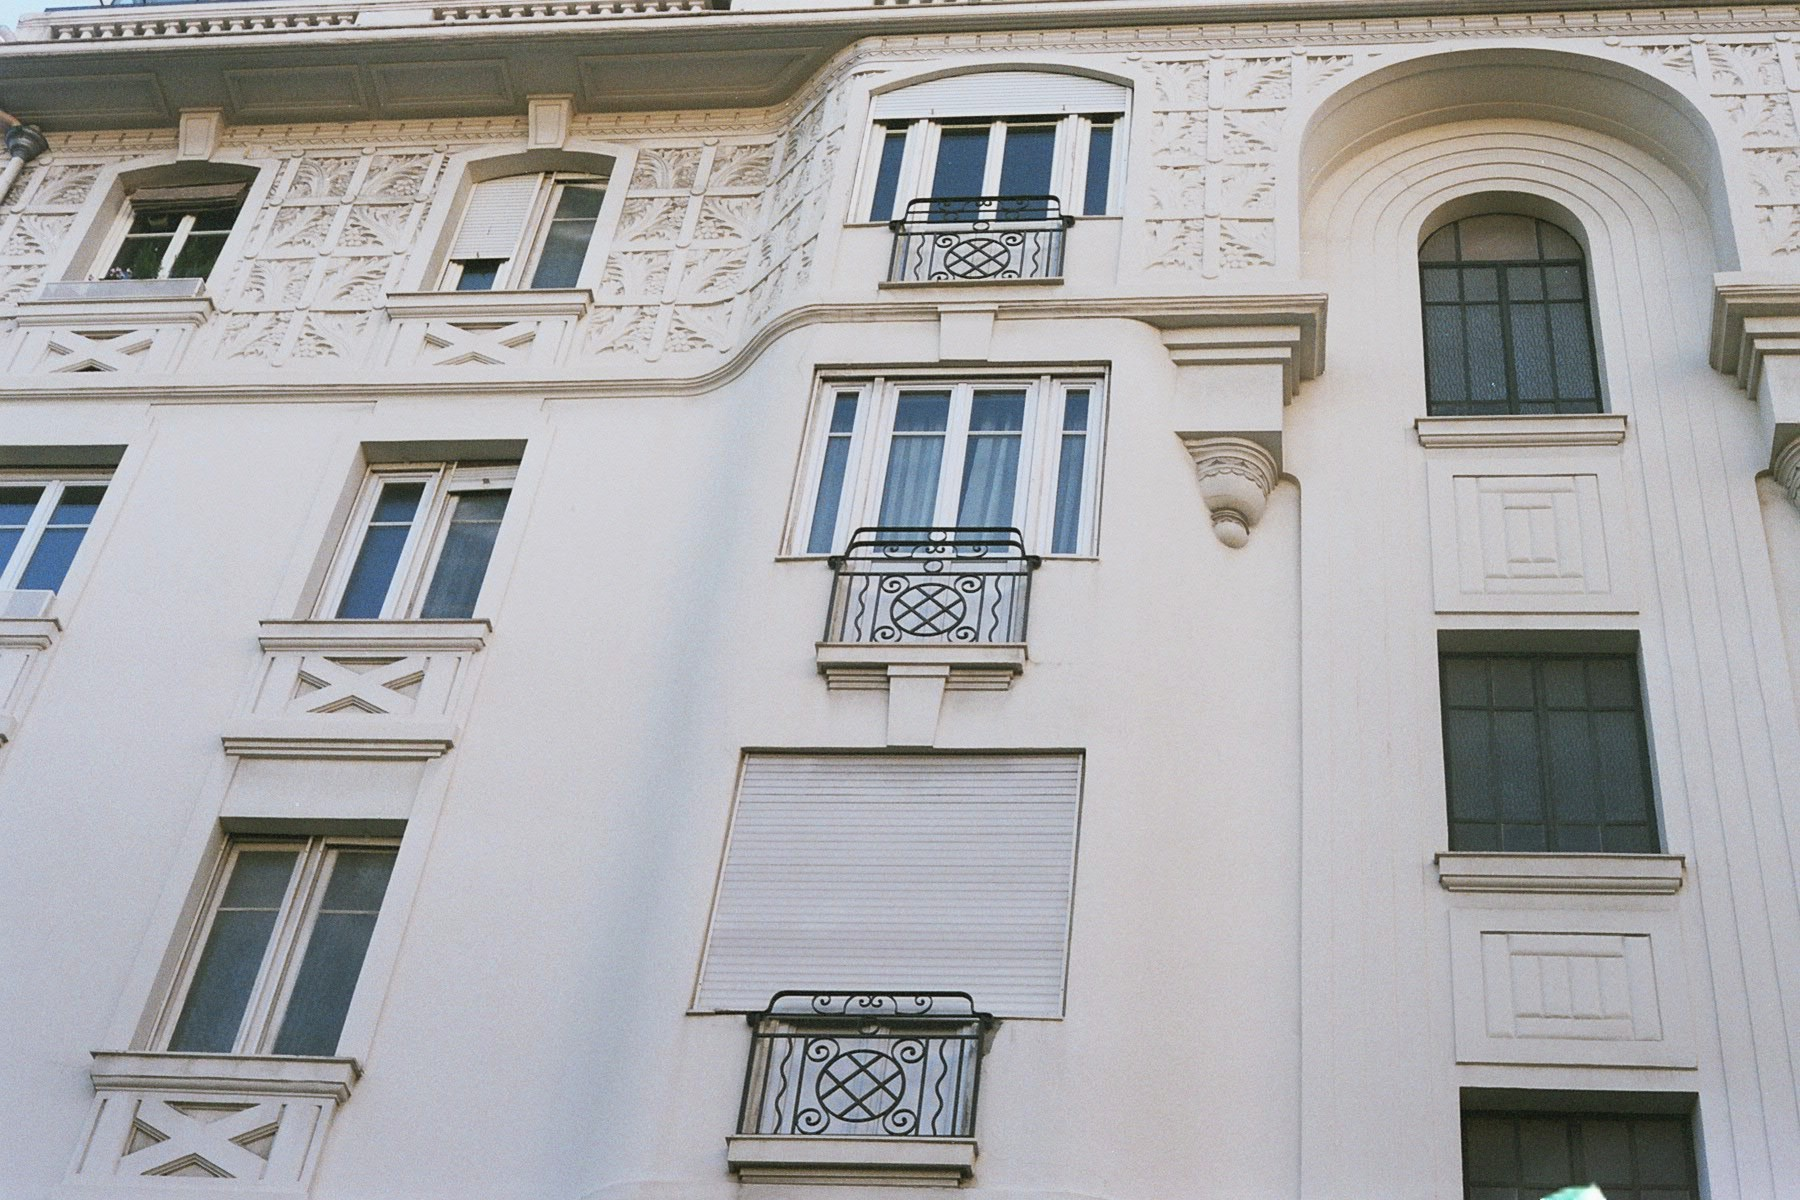 File:Nice white building 02.jpg - Wikimedia Commons